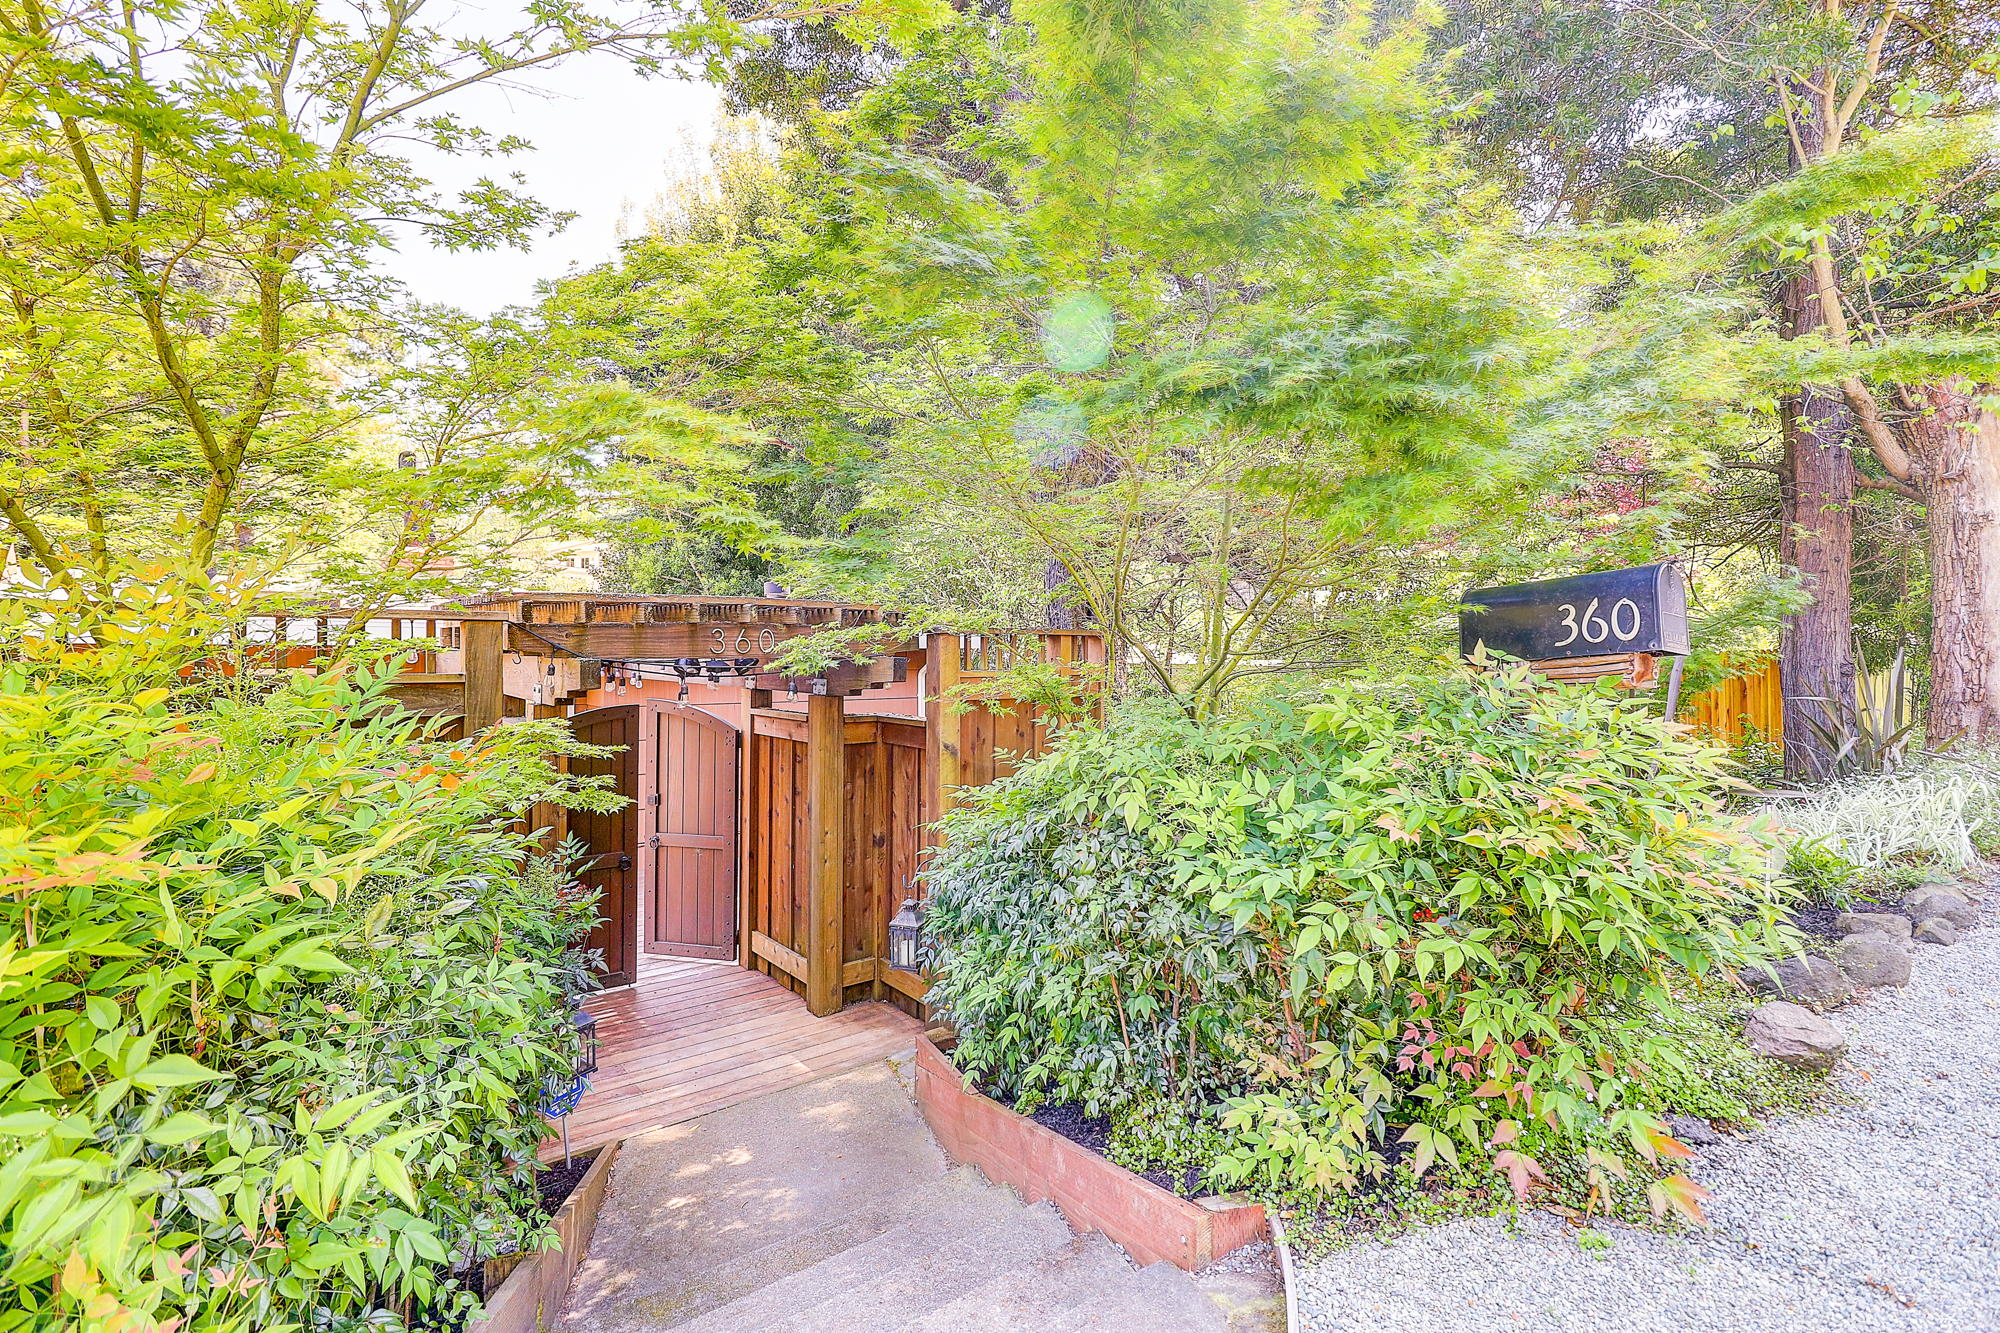 360 Corte Madera Avenue,  Marin County Top Realtor -57- Own Marin at Compass.jpg